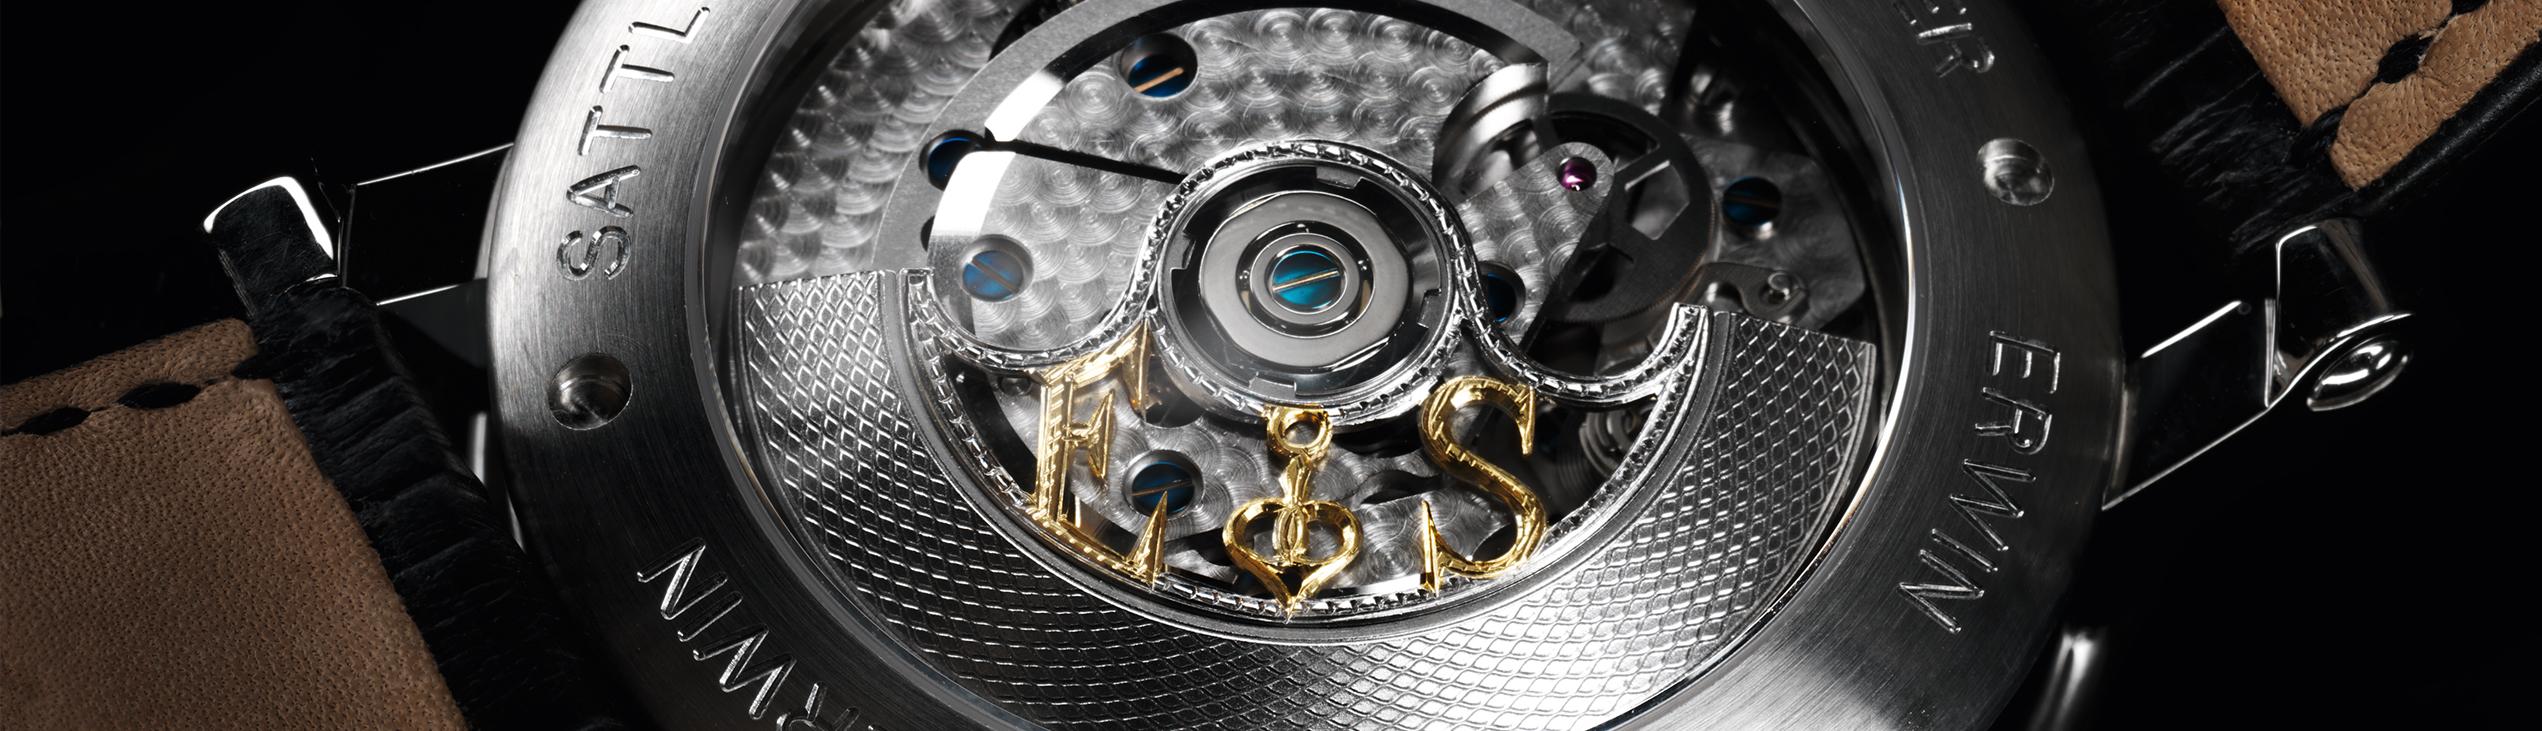 KATEGORIE-Armbanduhren